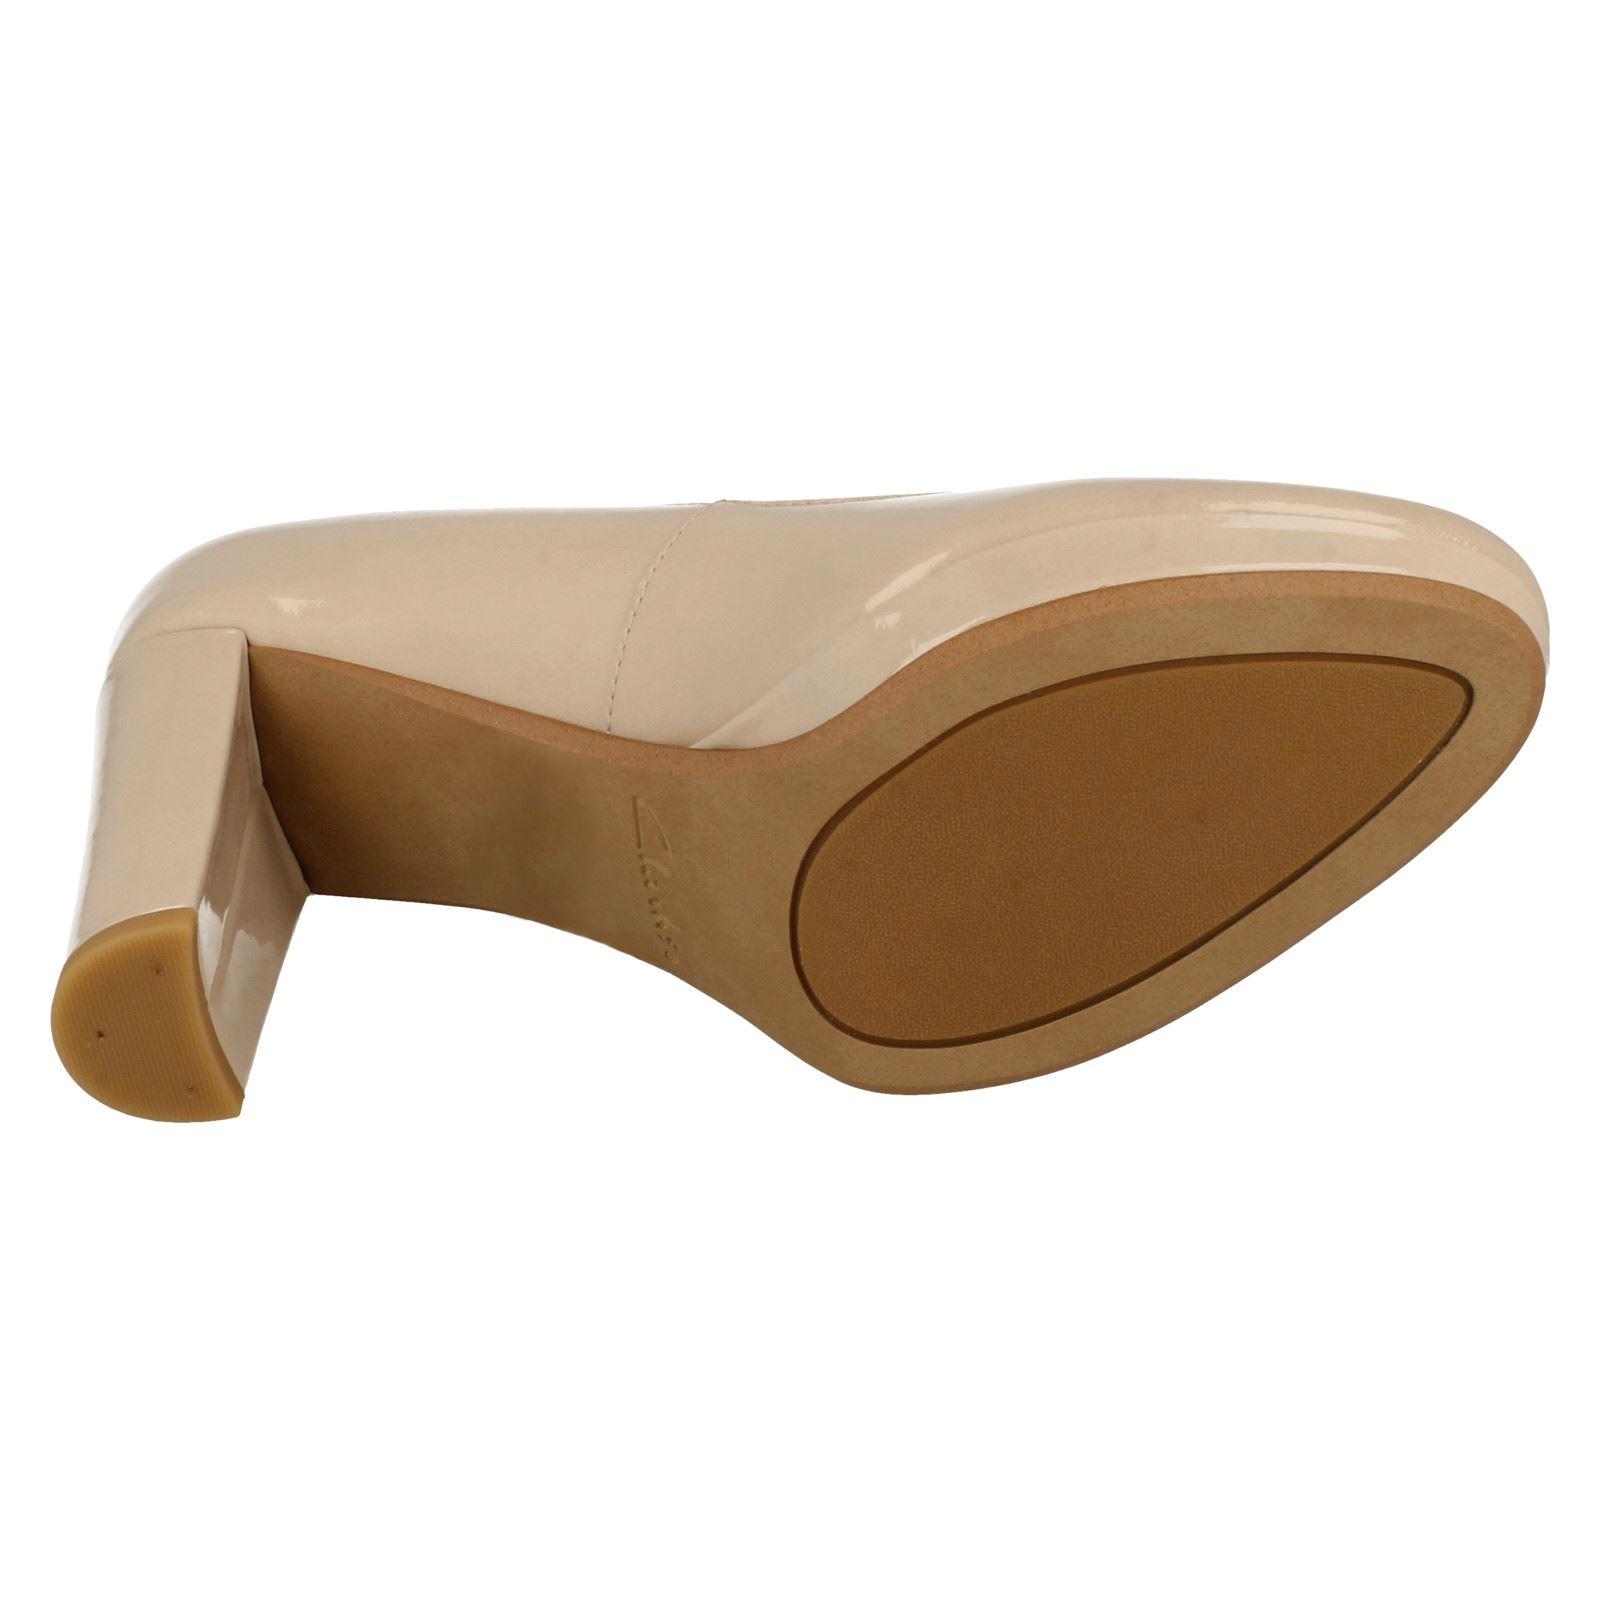 Clarks Womens Shoes / Red Shoes Clarks Lexi Jasmine slide Sandals RG166440j1w